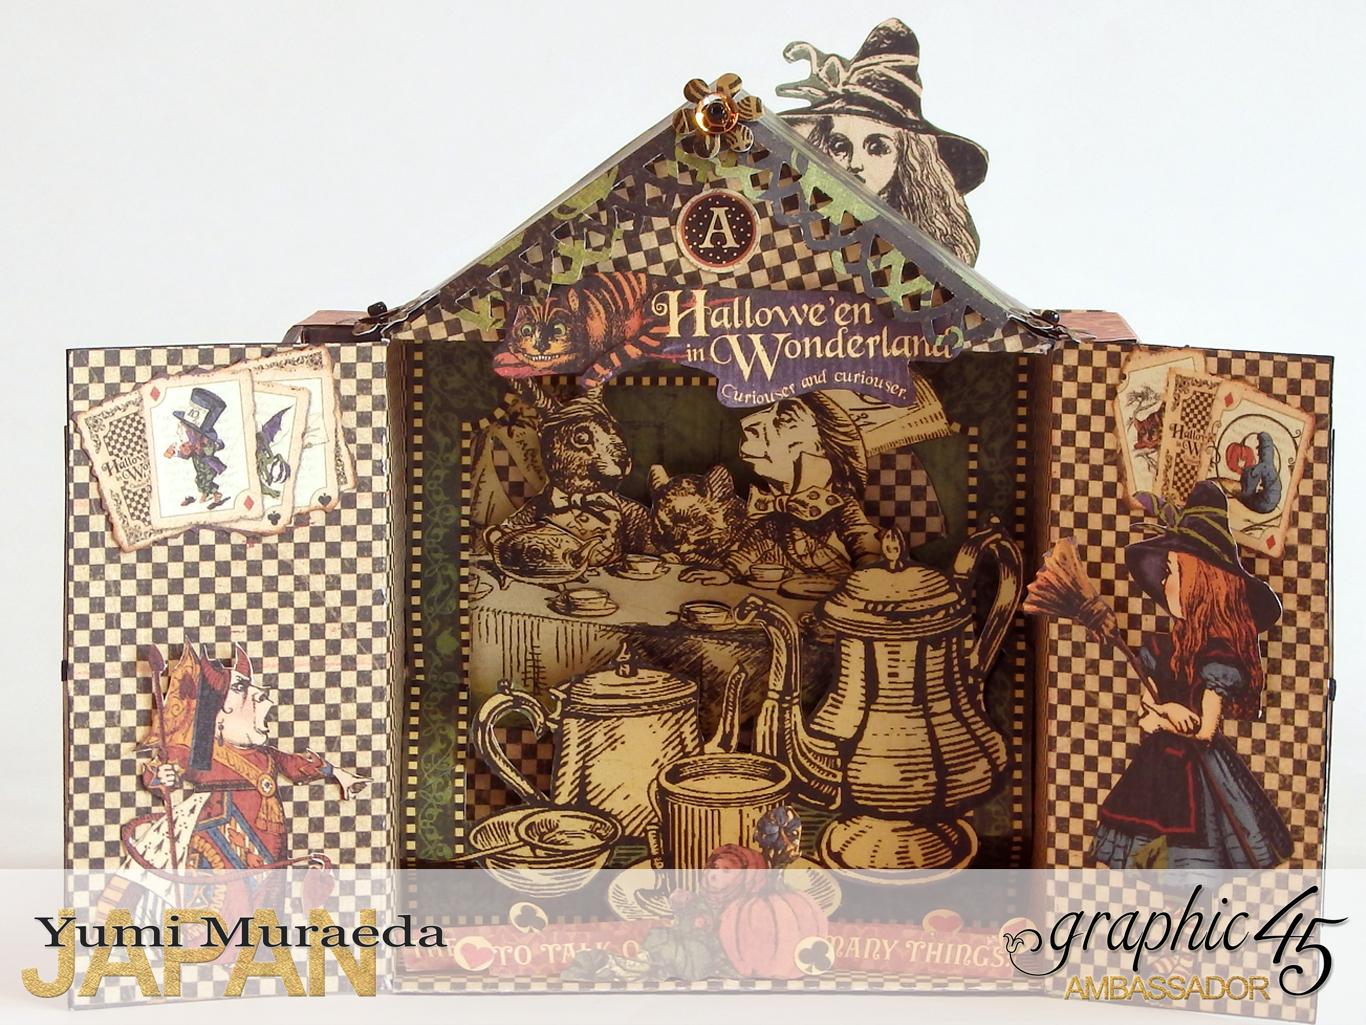 5 Alices Odd Tea HouseHalloween Wonderlandby Yumi MuraedaProduct by Graphic 45